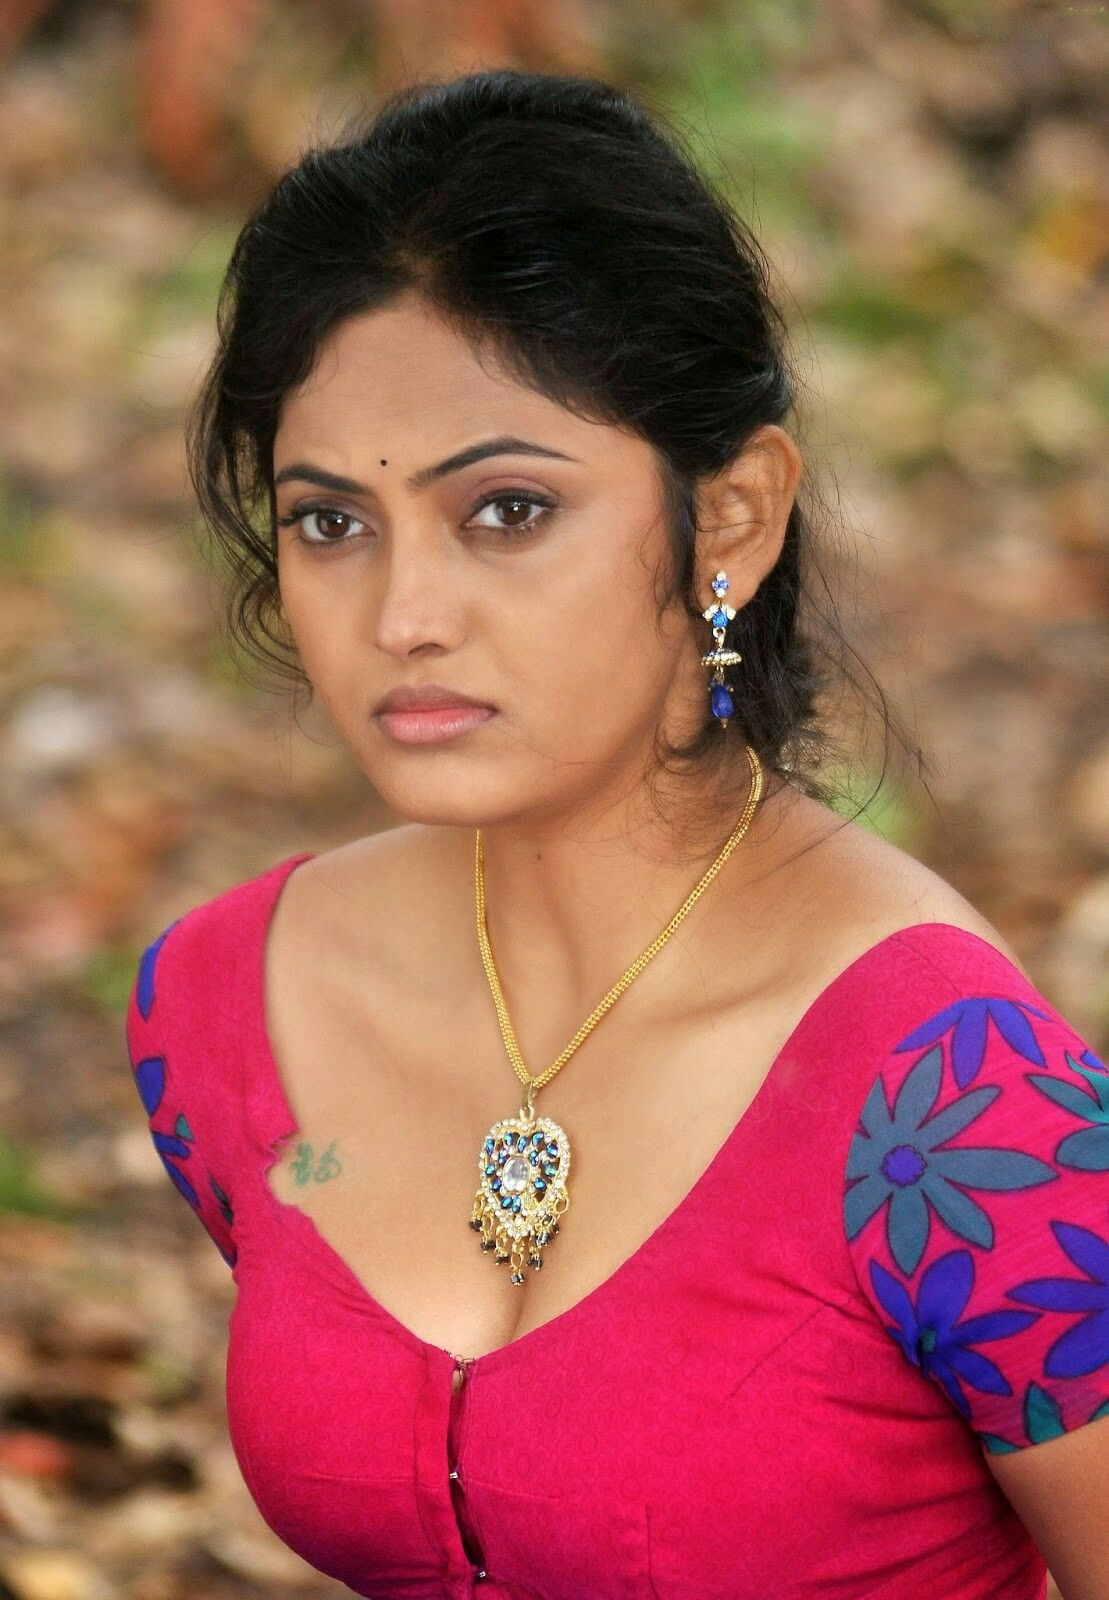 Telugu girls boobs, shy love facial pics and vids